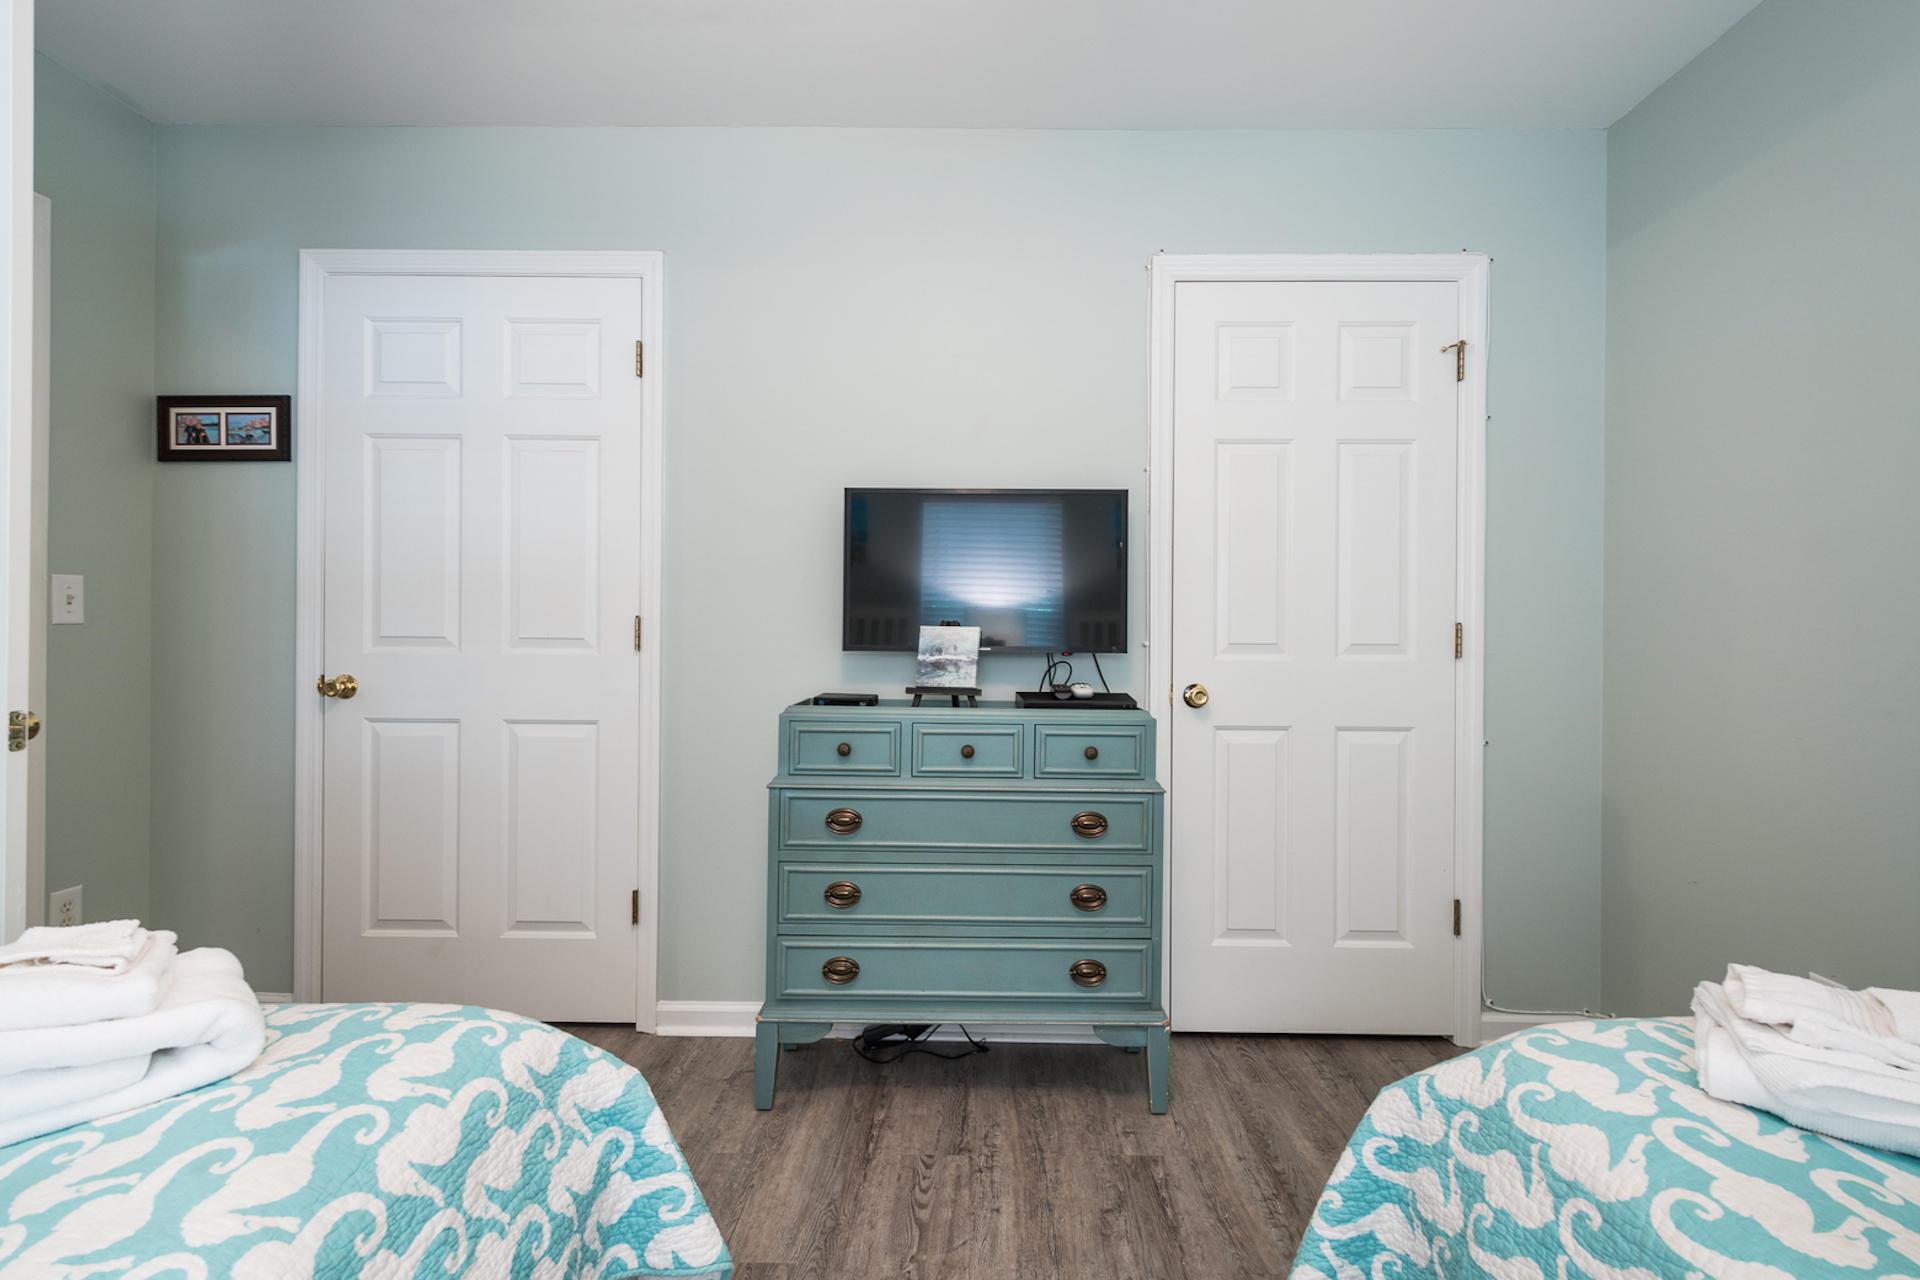 Meridian Place Homes For Sale - 1420 Amanda Park, Charleston, SC - 5